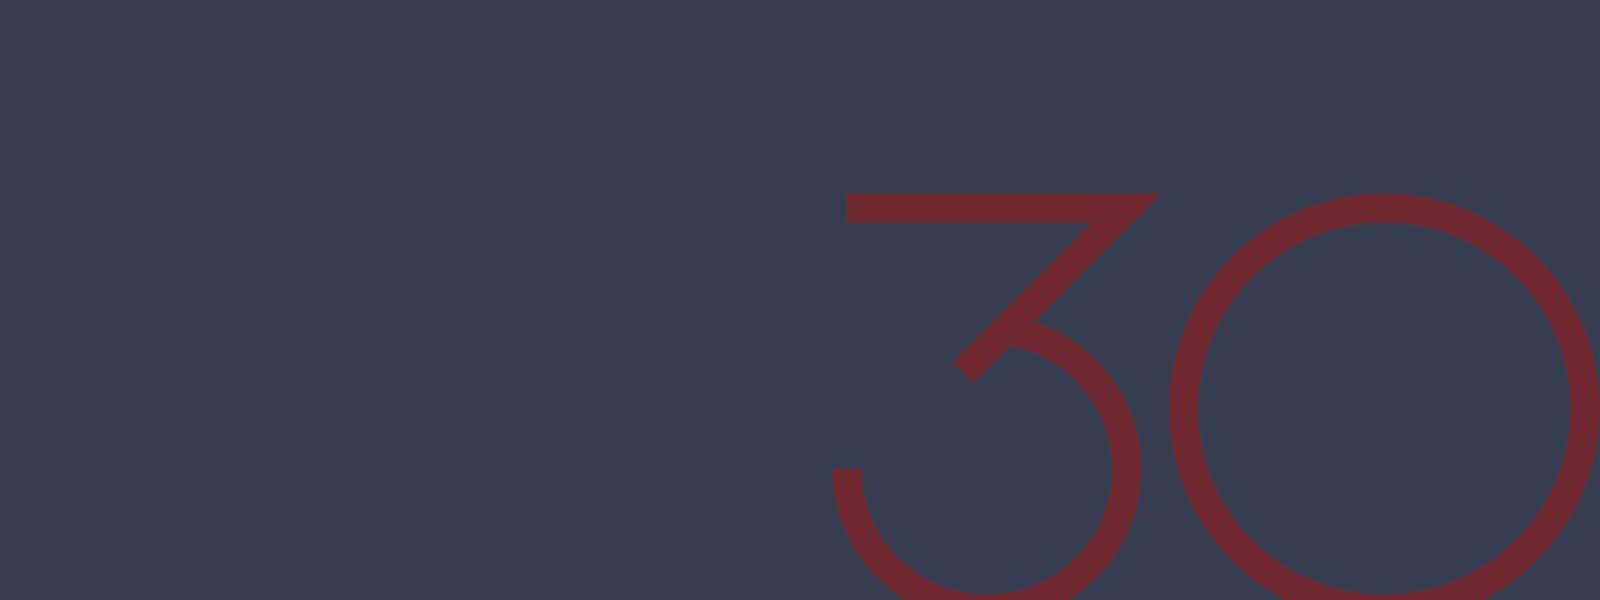 Website Headers_6t30 - Dark Red 4